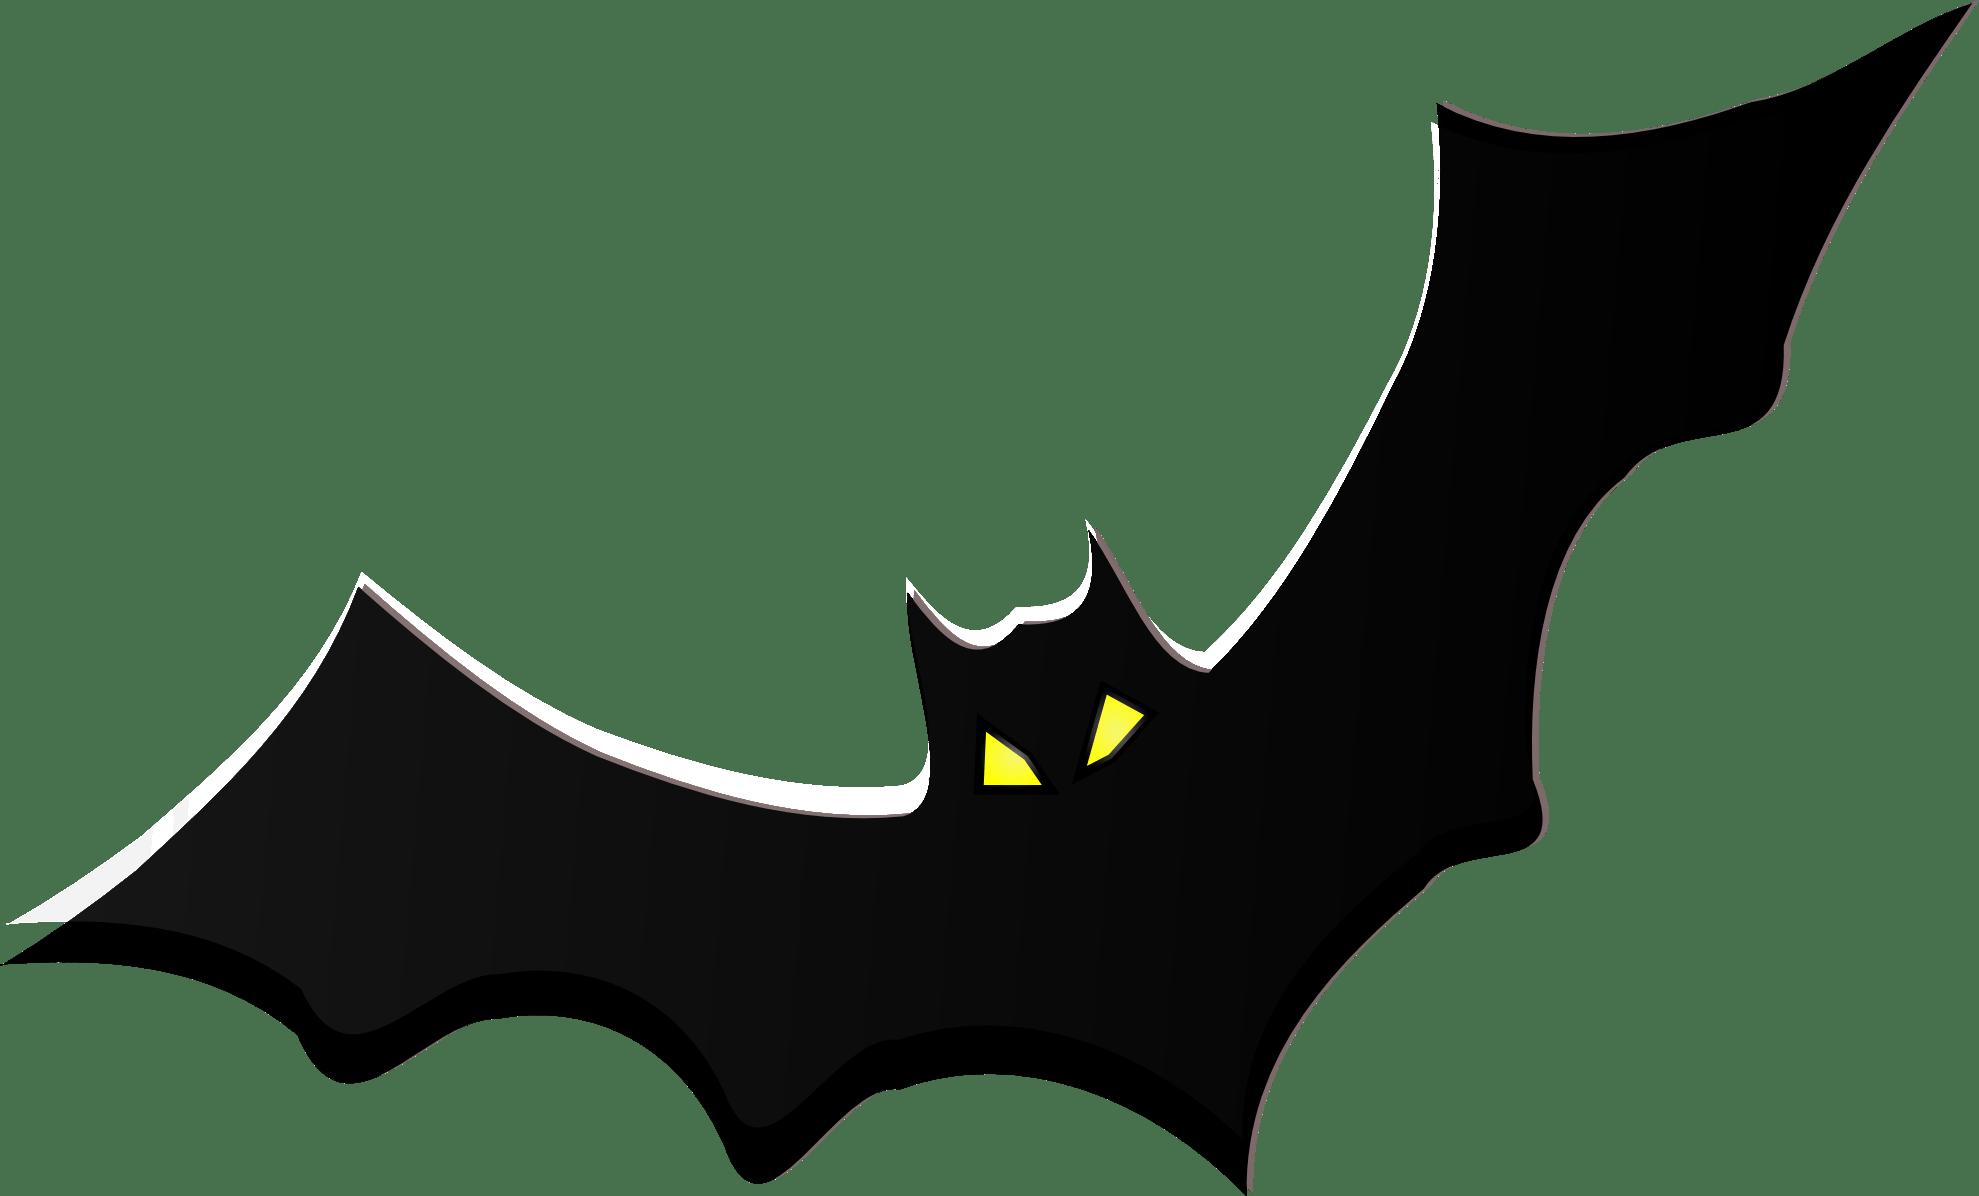 Logo png stickpng. Bat clipart transparent background